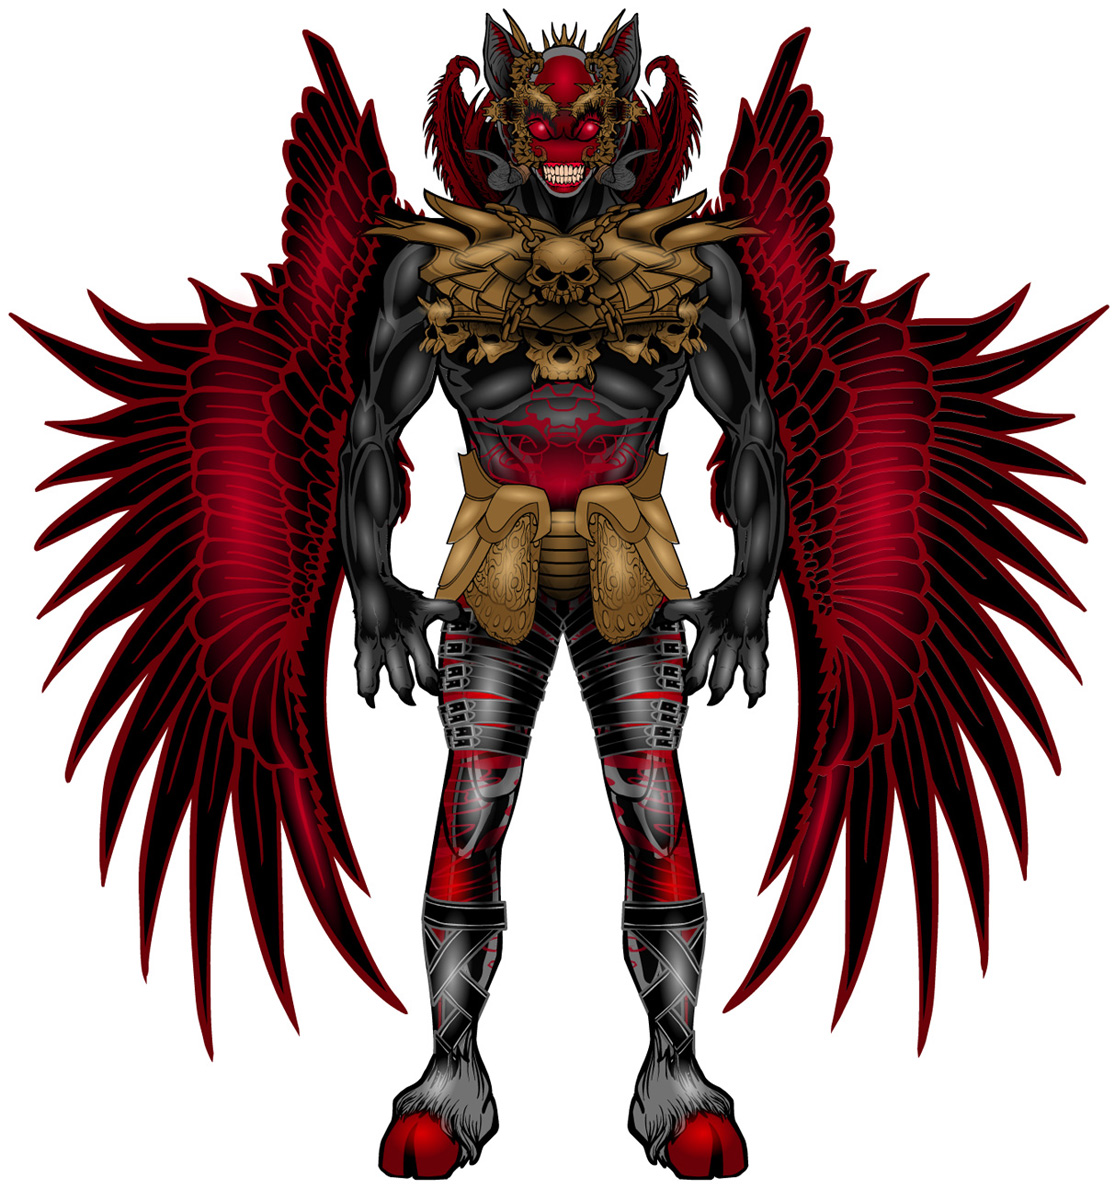 http://www.heromachine.com/wp-content/legacy/forum-image-uploads/dblade/2013/01/dblade_VraxDemon2.jpg